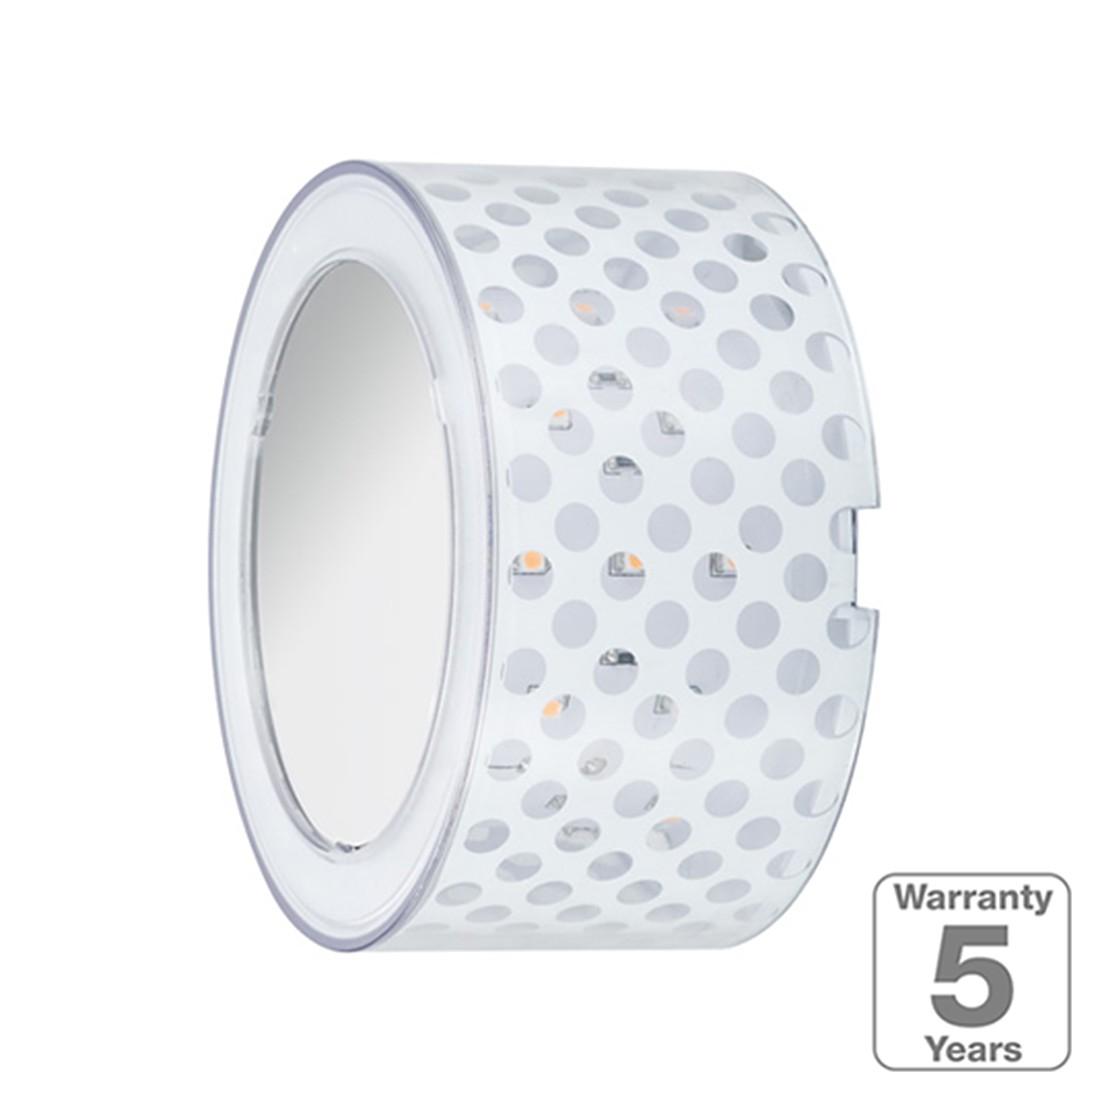 EEK A+, LED- Wand- und Deckenleuchte DecoBeam – 1-flammig, Paulmann online bestellen